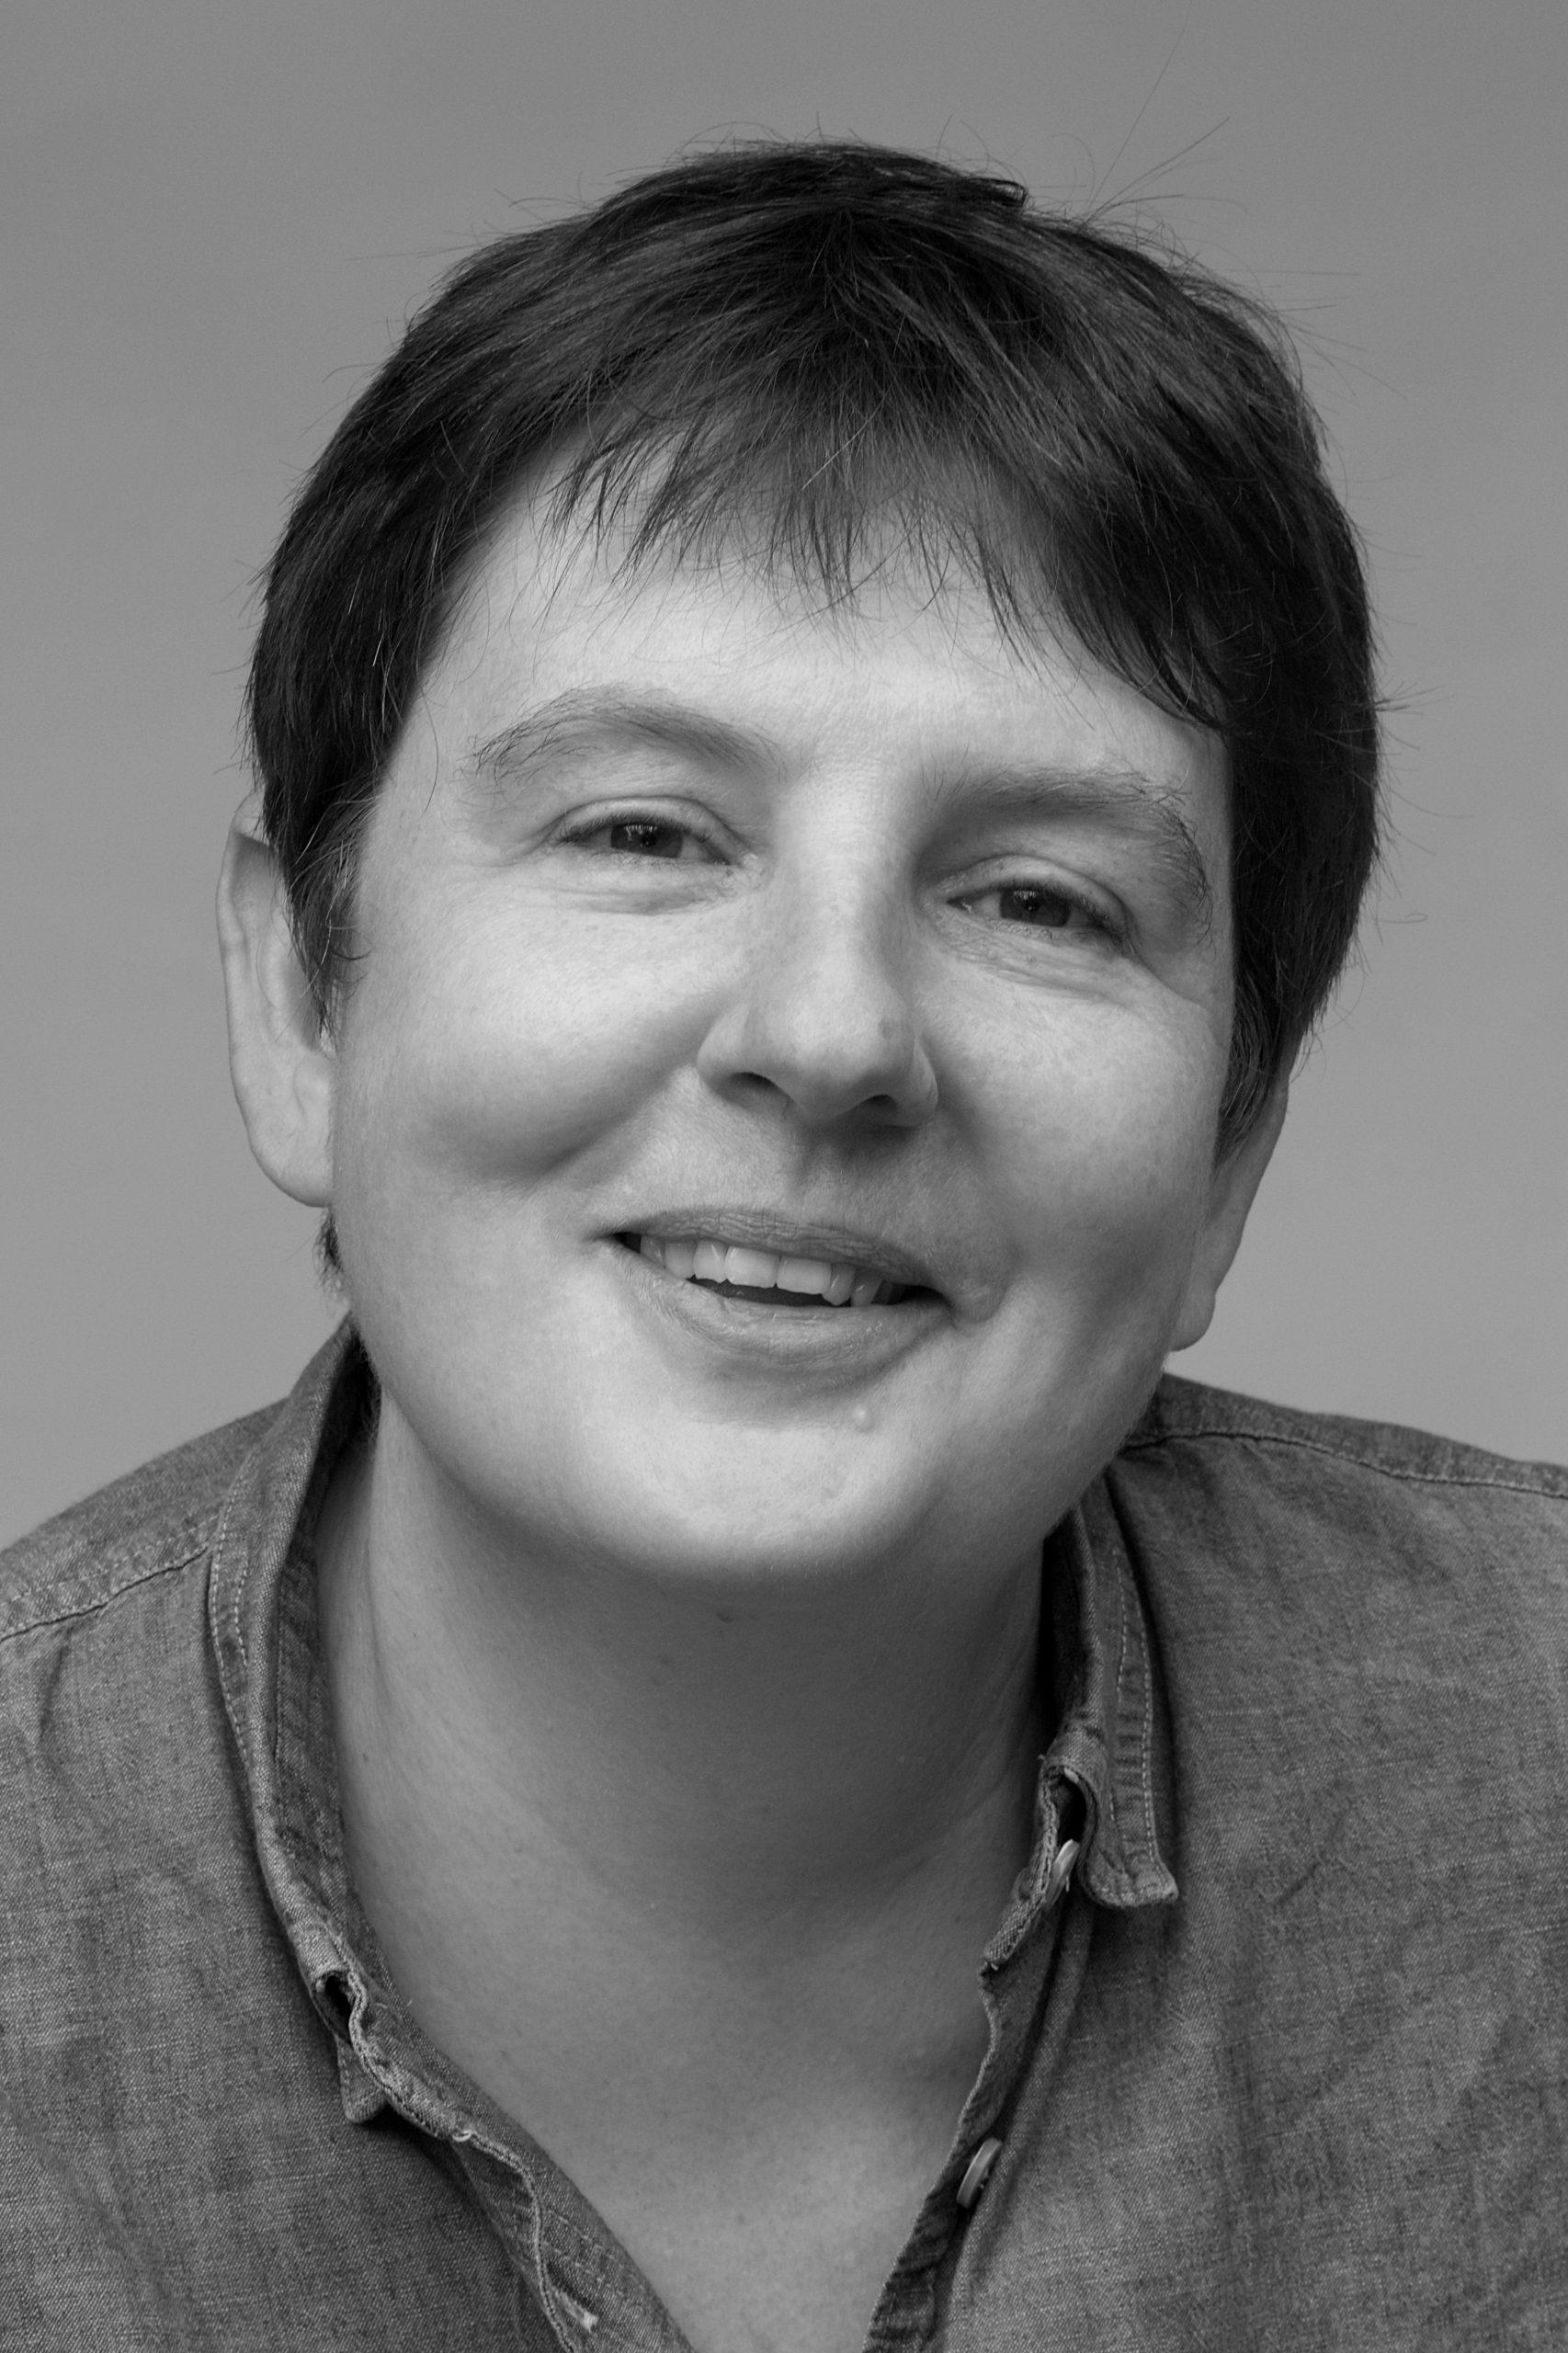 Black and white portrait of Emma Smith